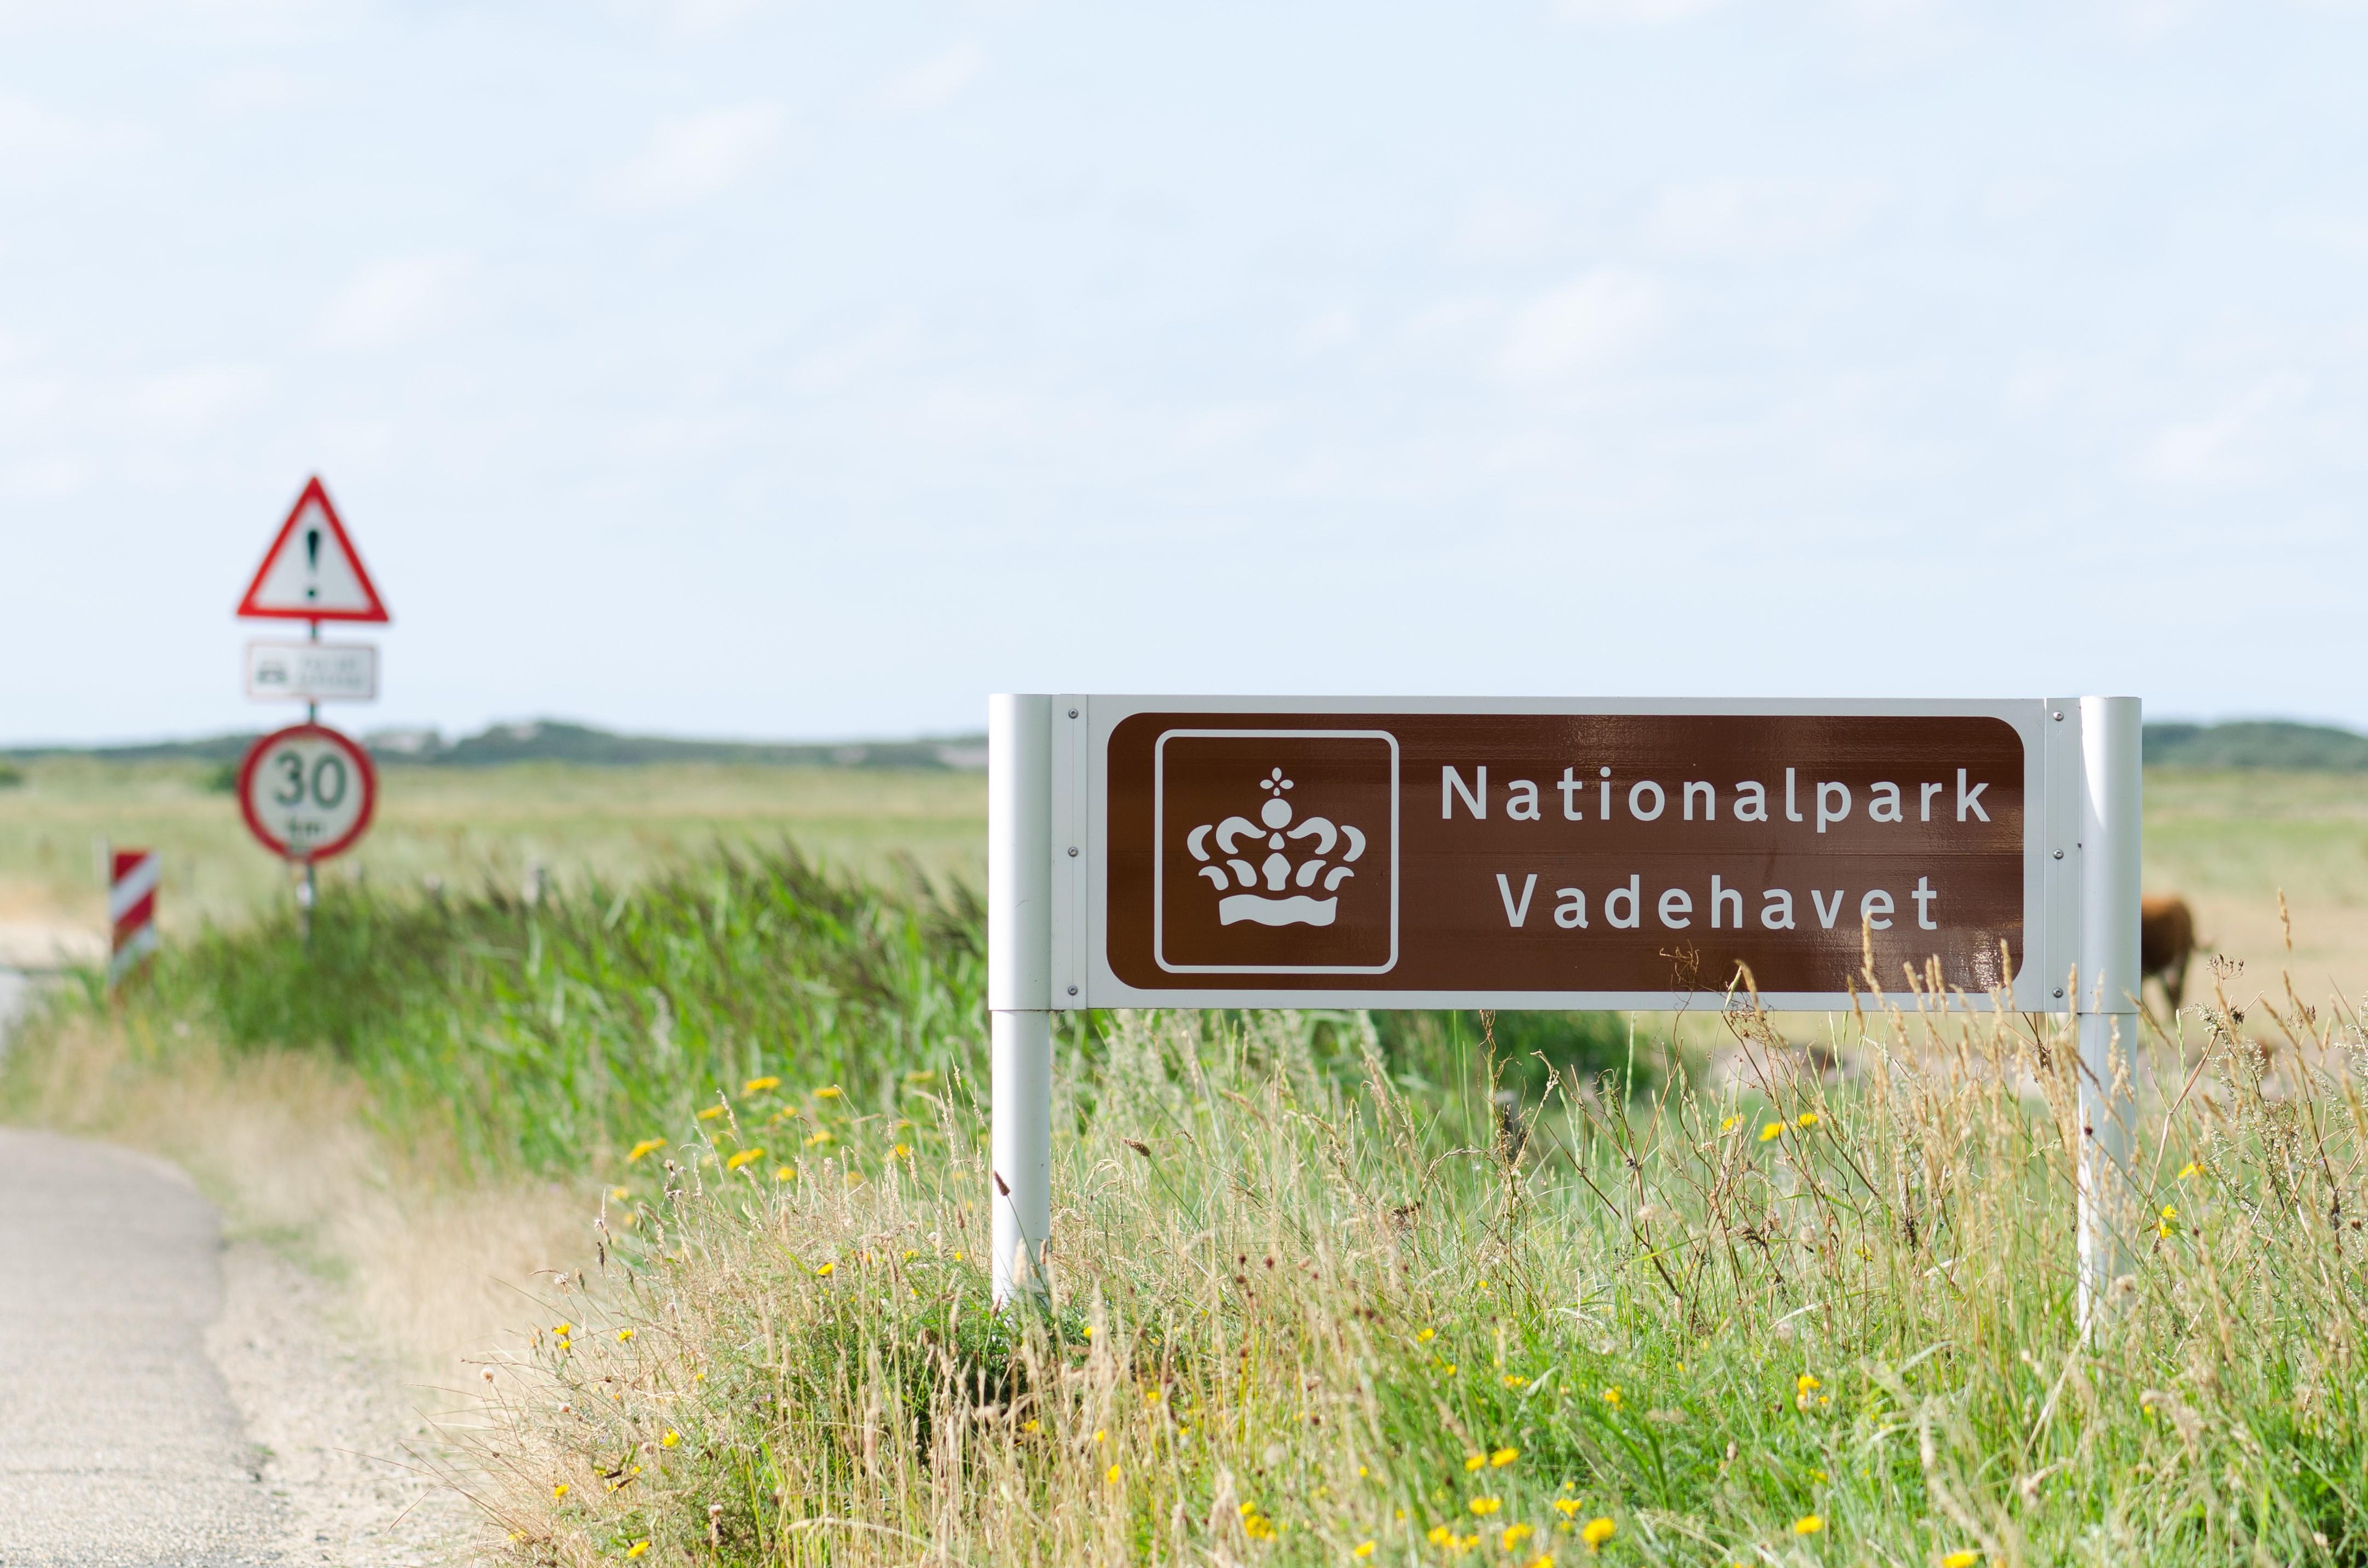 Regeringen vil fjerne naturbeskyttelse i nationalparker